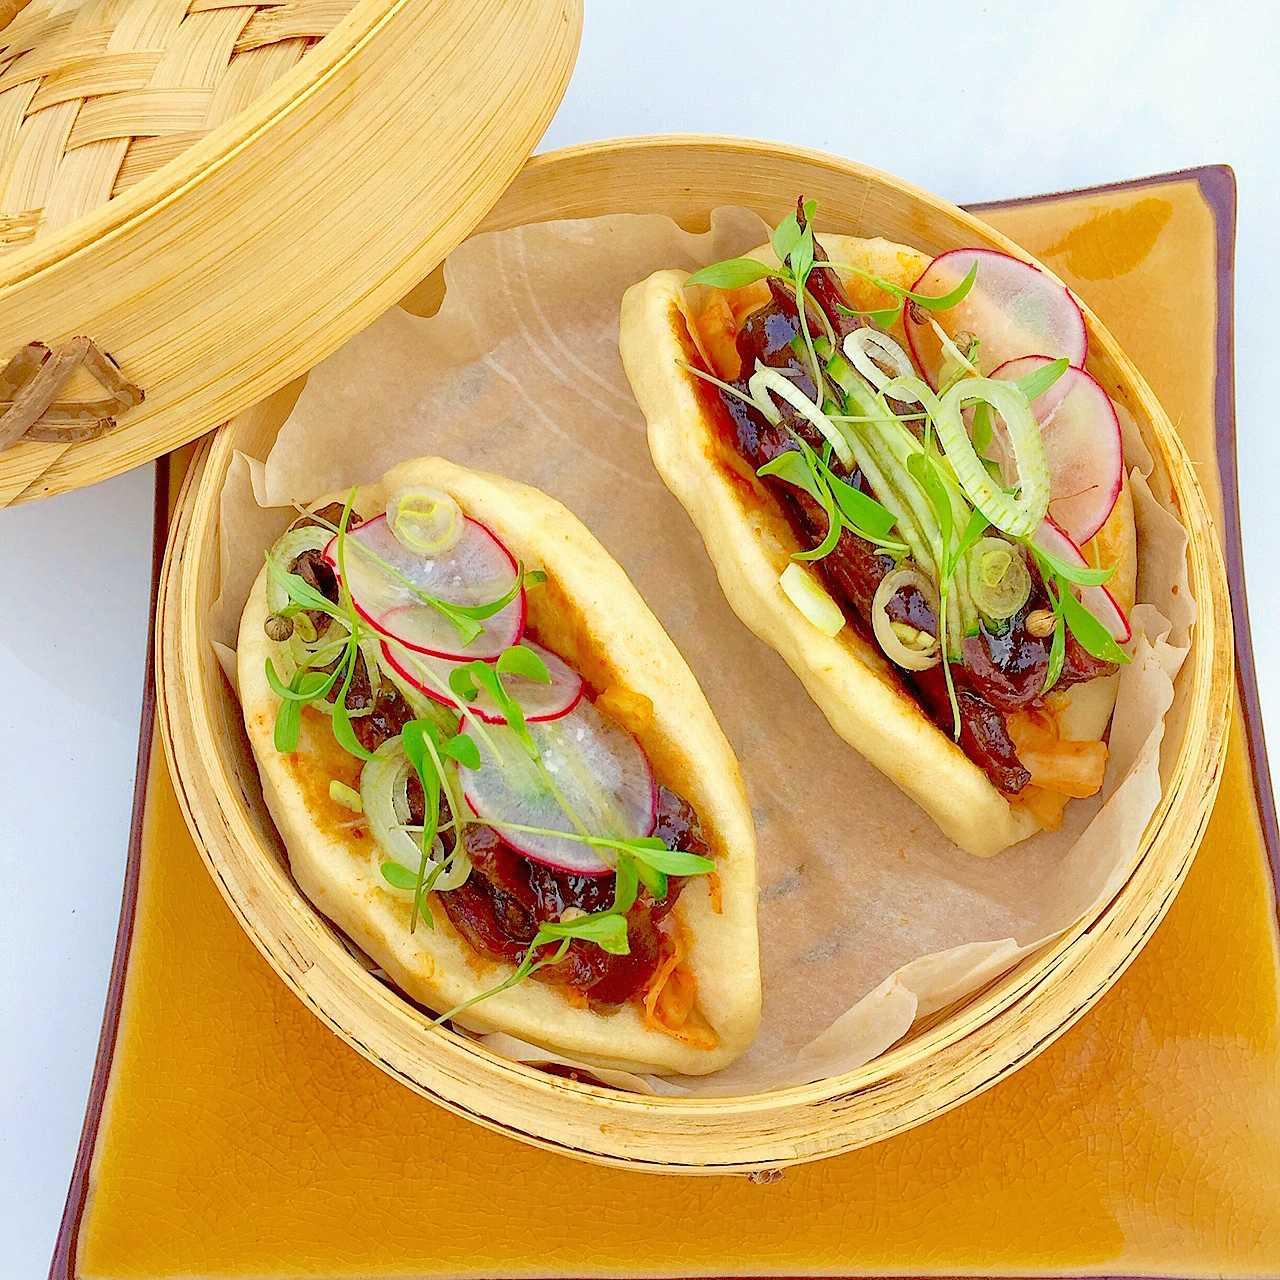 Steamed Buns (Bao) with short rib and kimchi